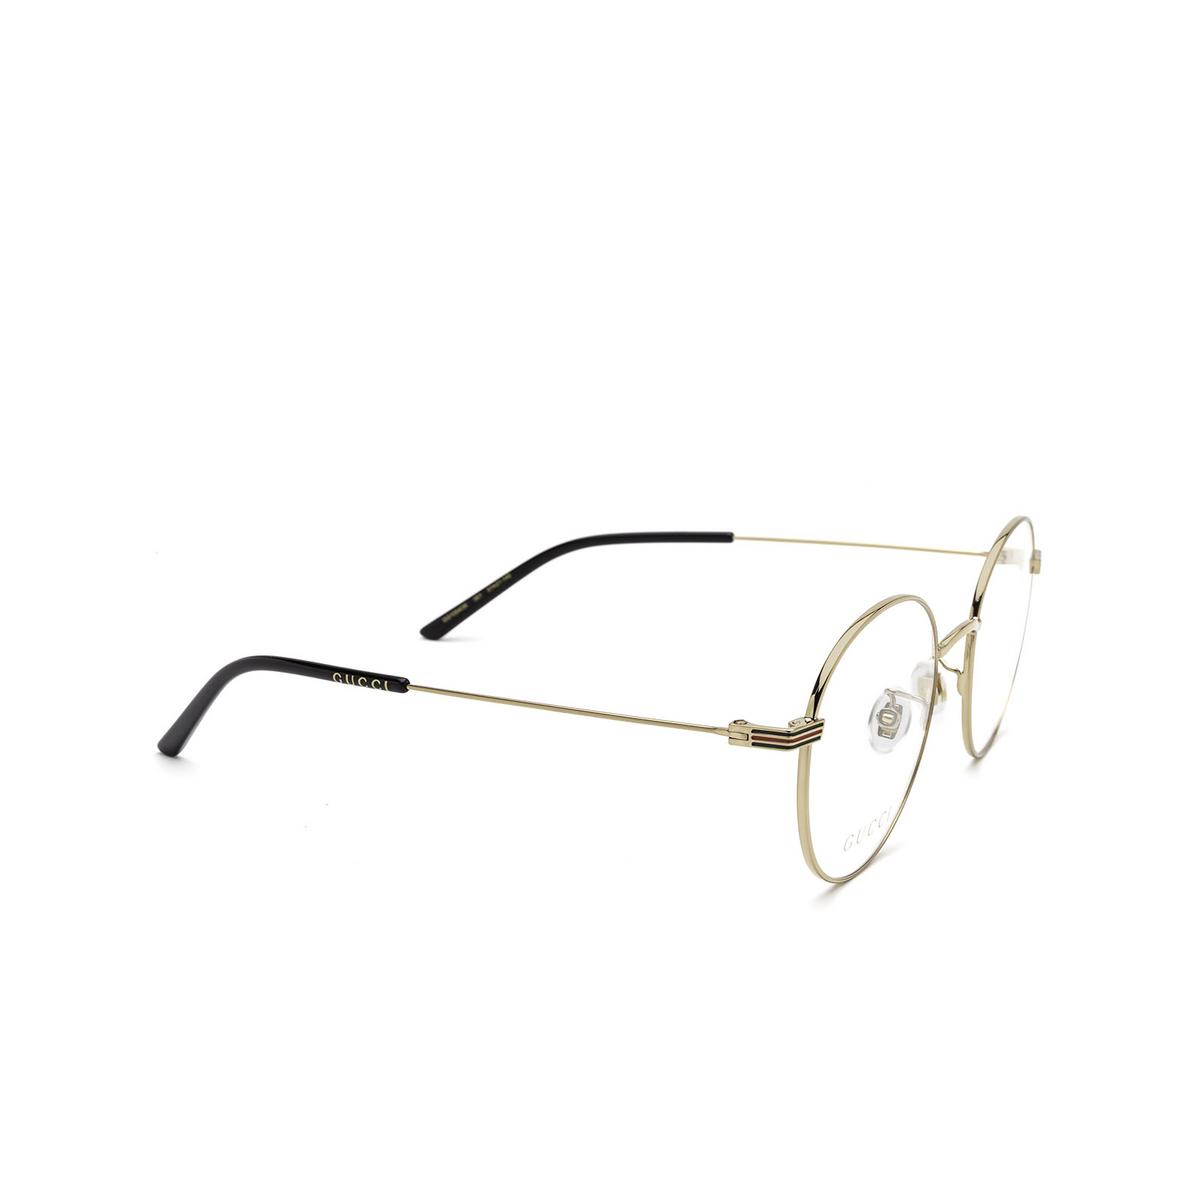 Gucci® Round Eyeglasses: GG1054OK color Gold 001 - three-quarters view.